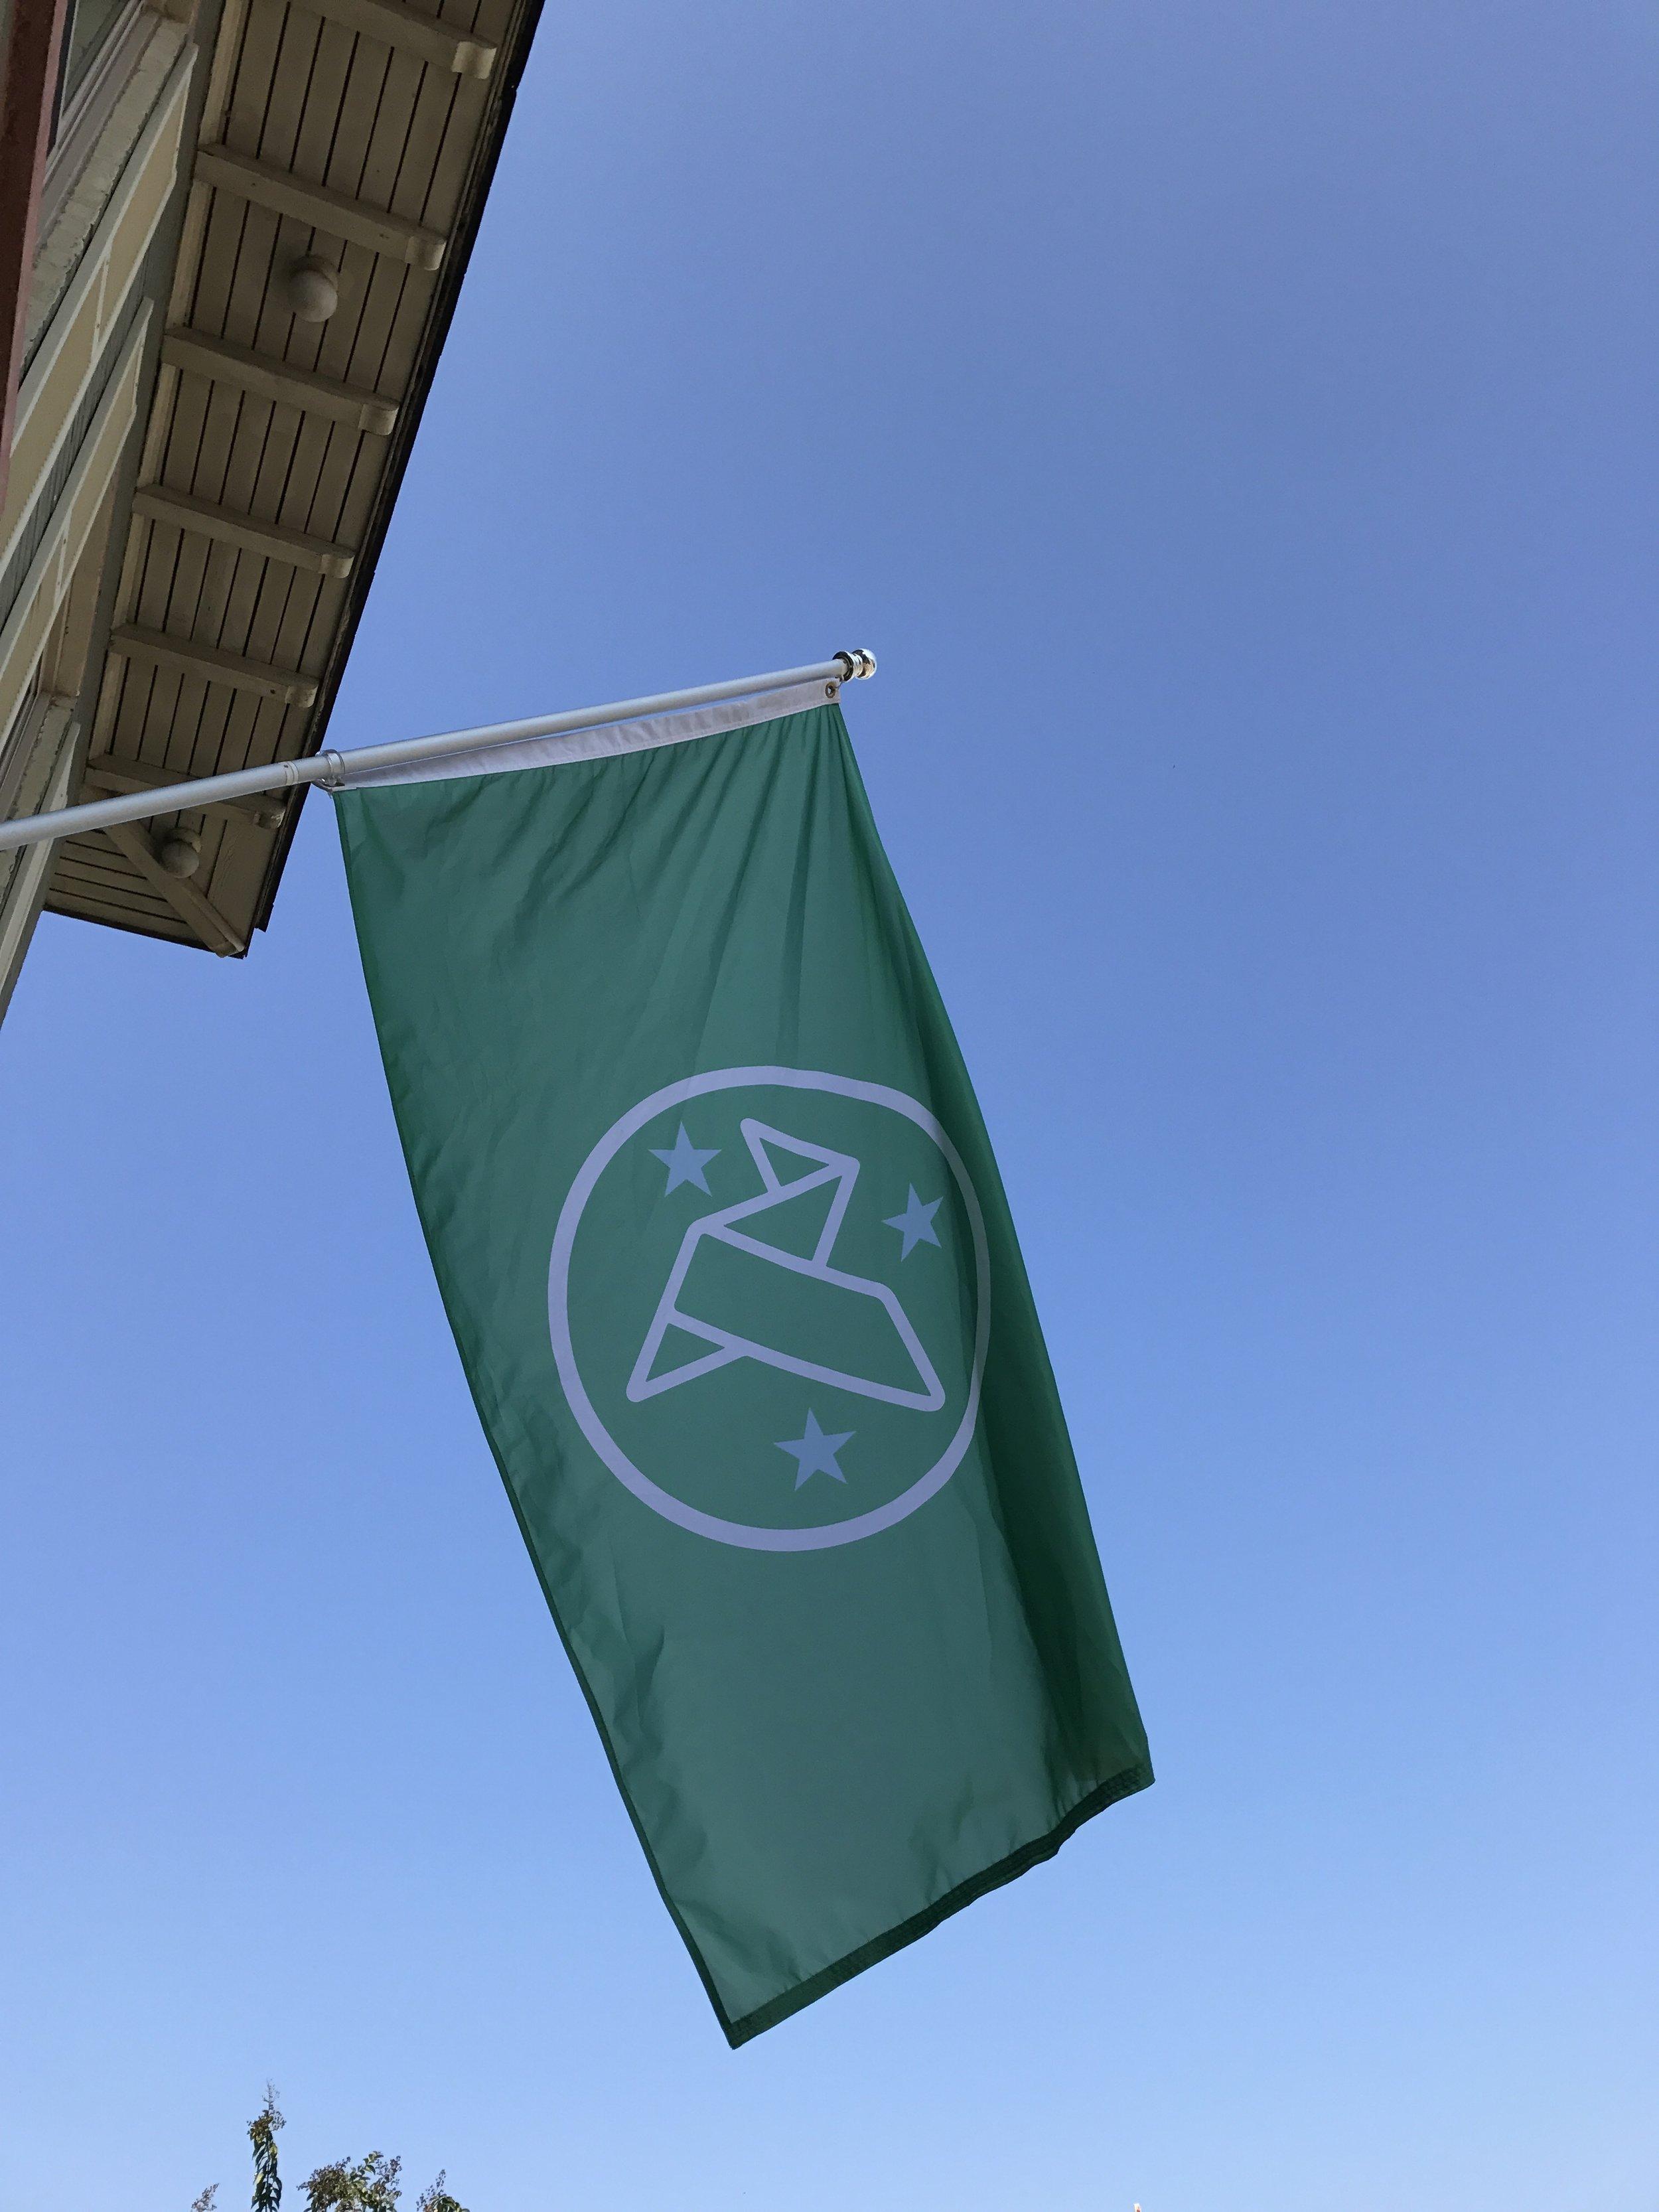 HGVL FLAG!